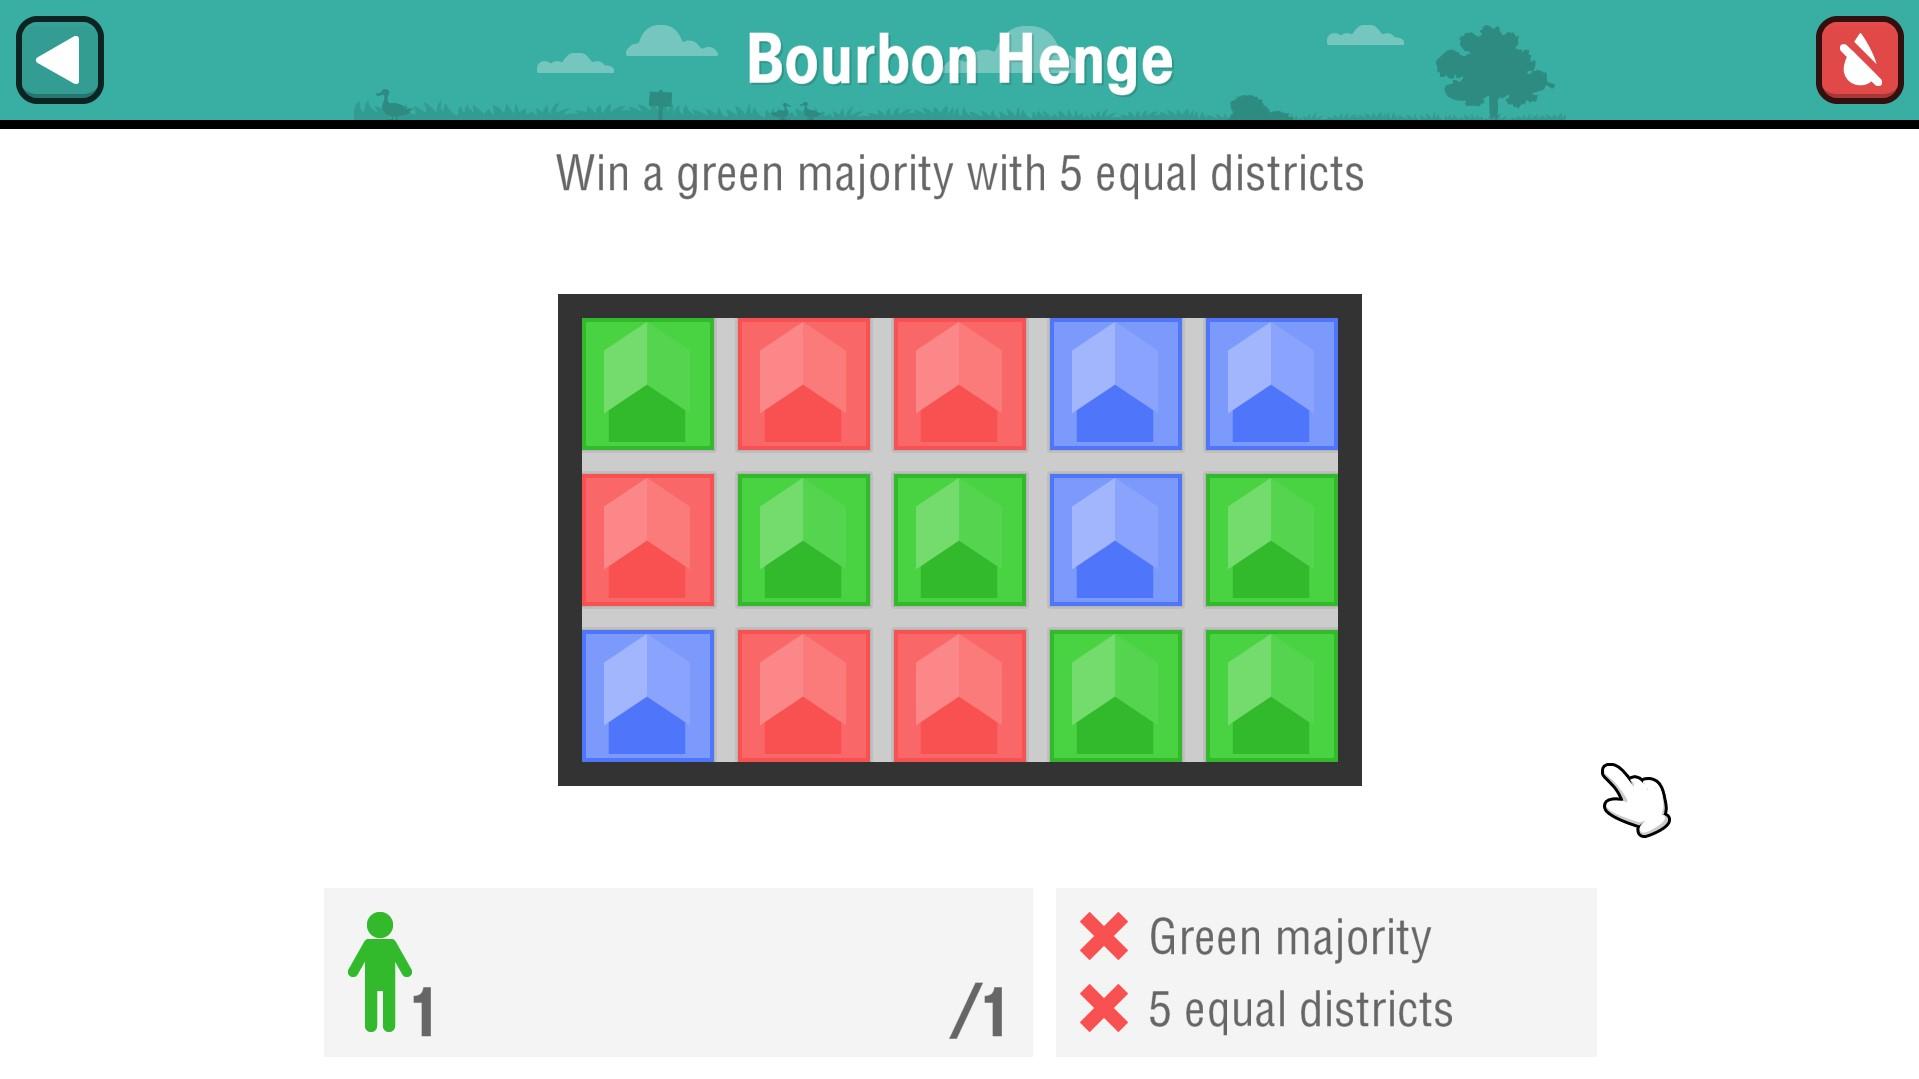 Bourbon Henge